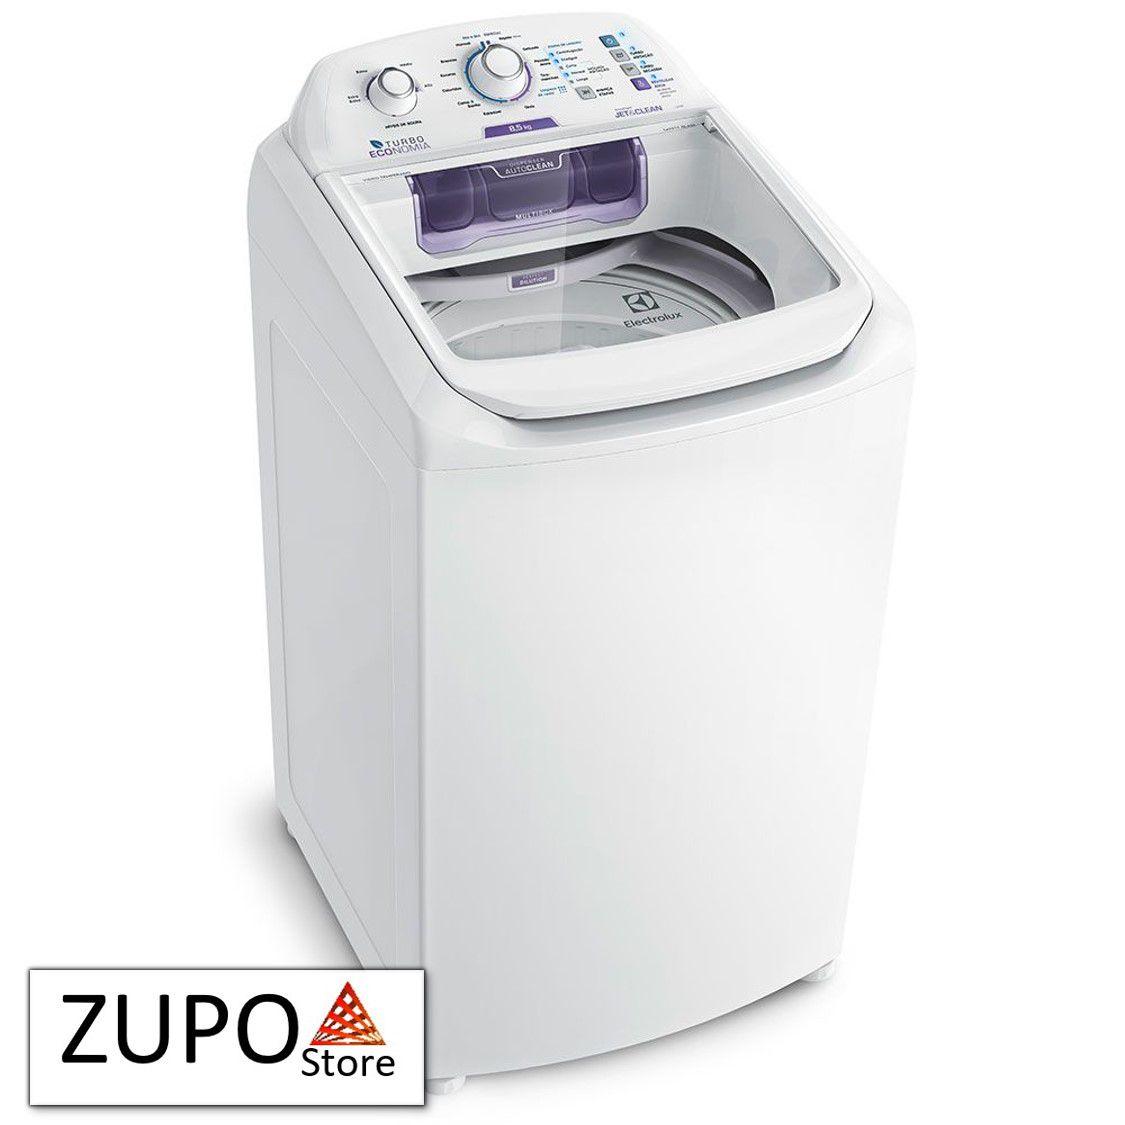 Lavadora de Roupas 8,5 Kilos Branca Electrolux - LAC09 - 127V